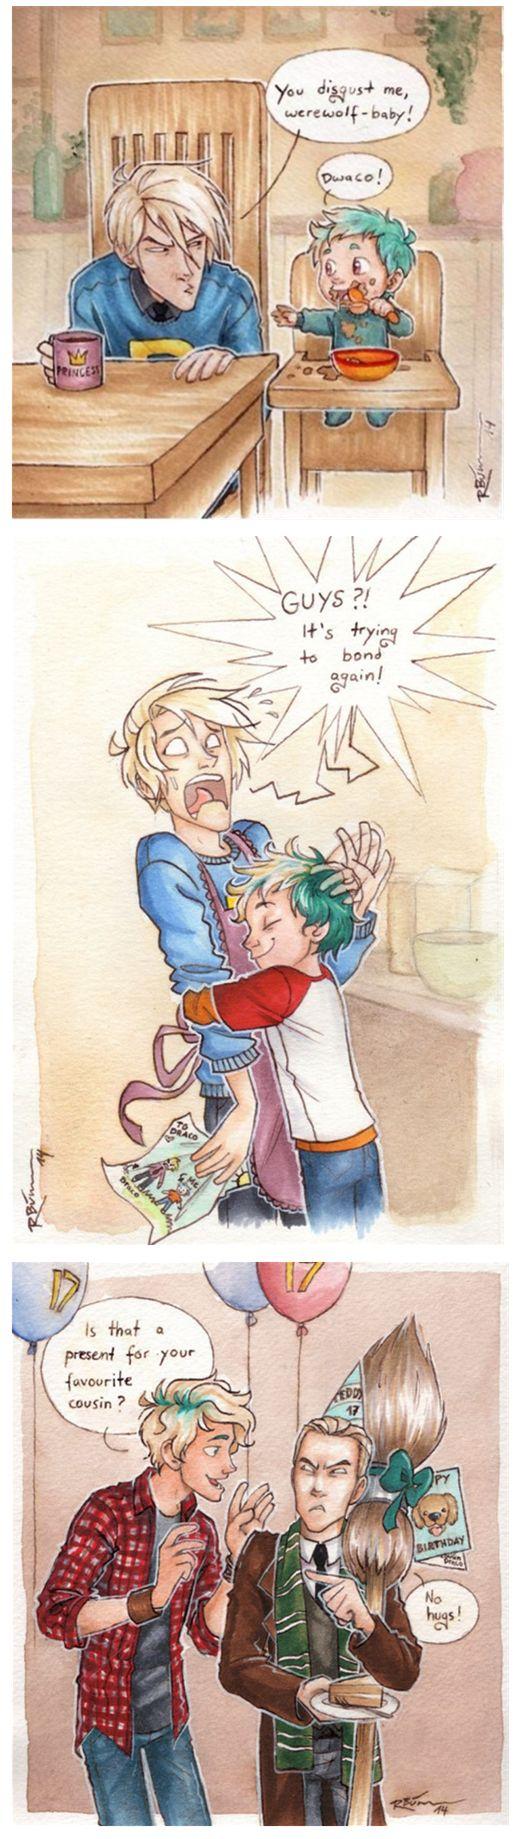 Draco and Teddy (Draco wears a Weasley sweater! and has a princess mug!) ... draco malfidus, harry potter, teddy lupin, draco, malfidus, teddy, lupin